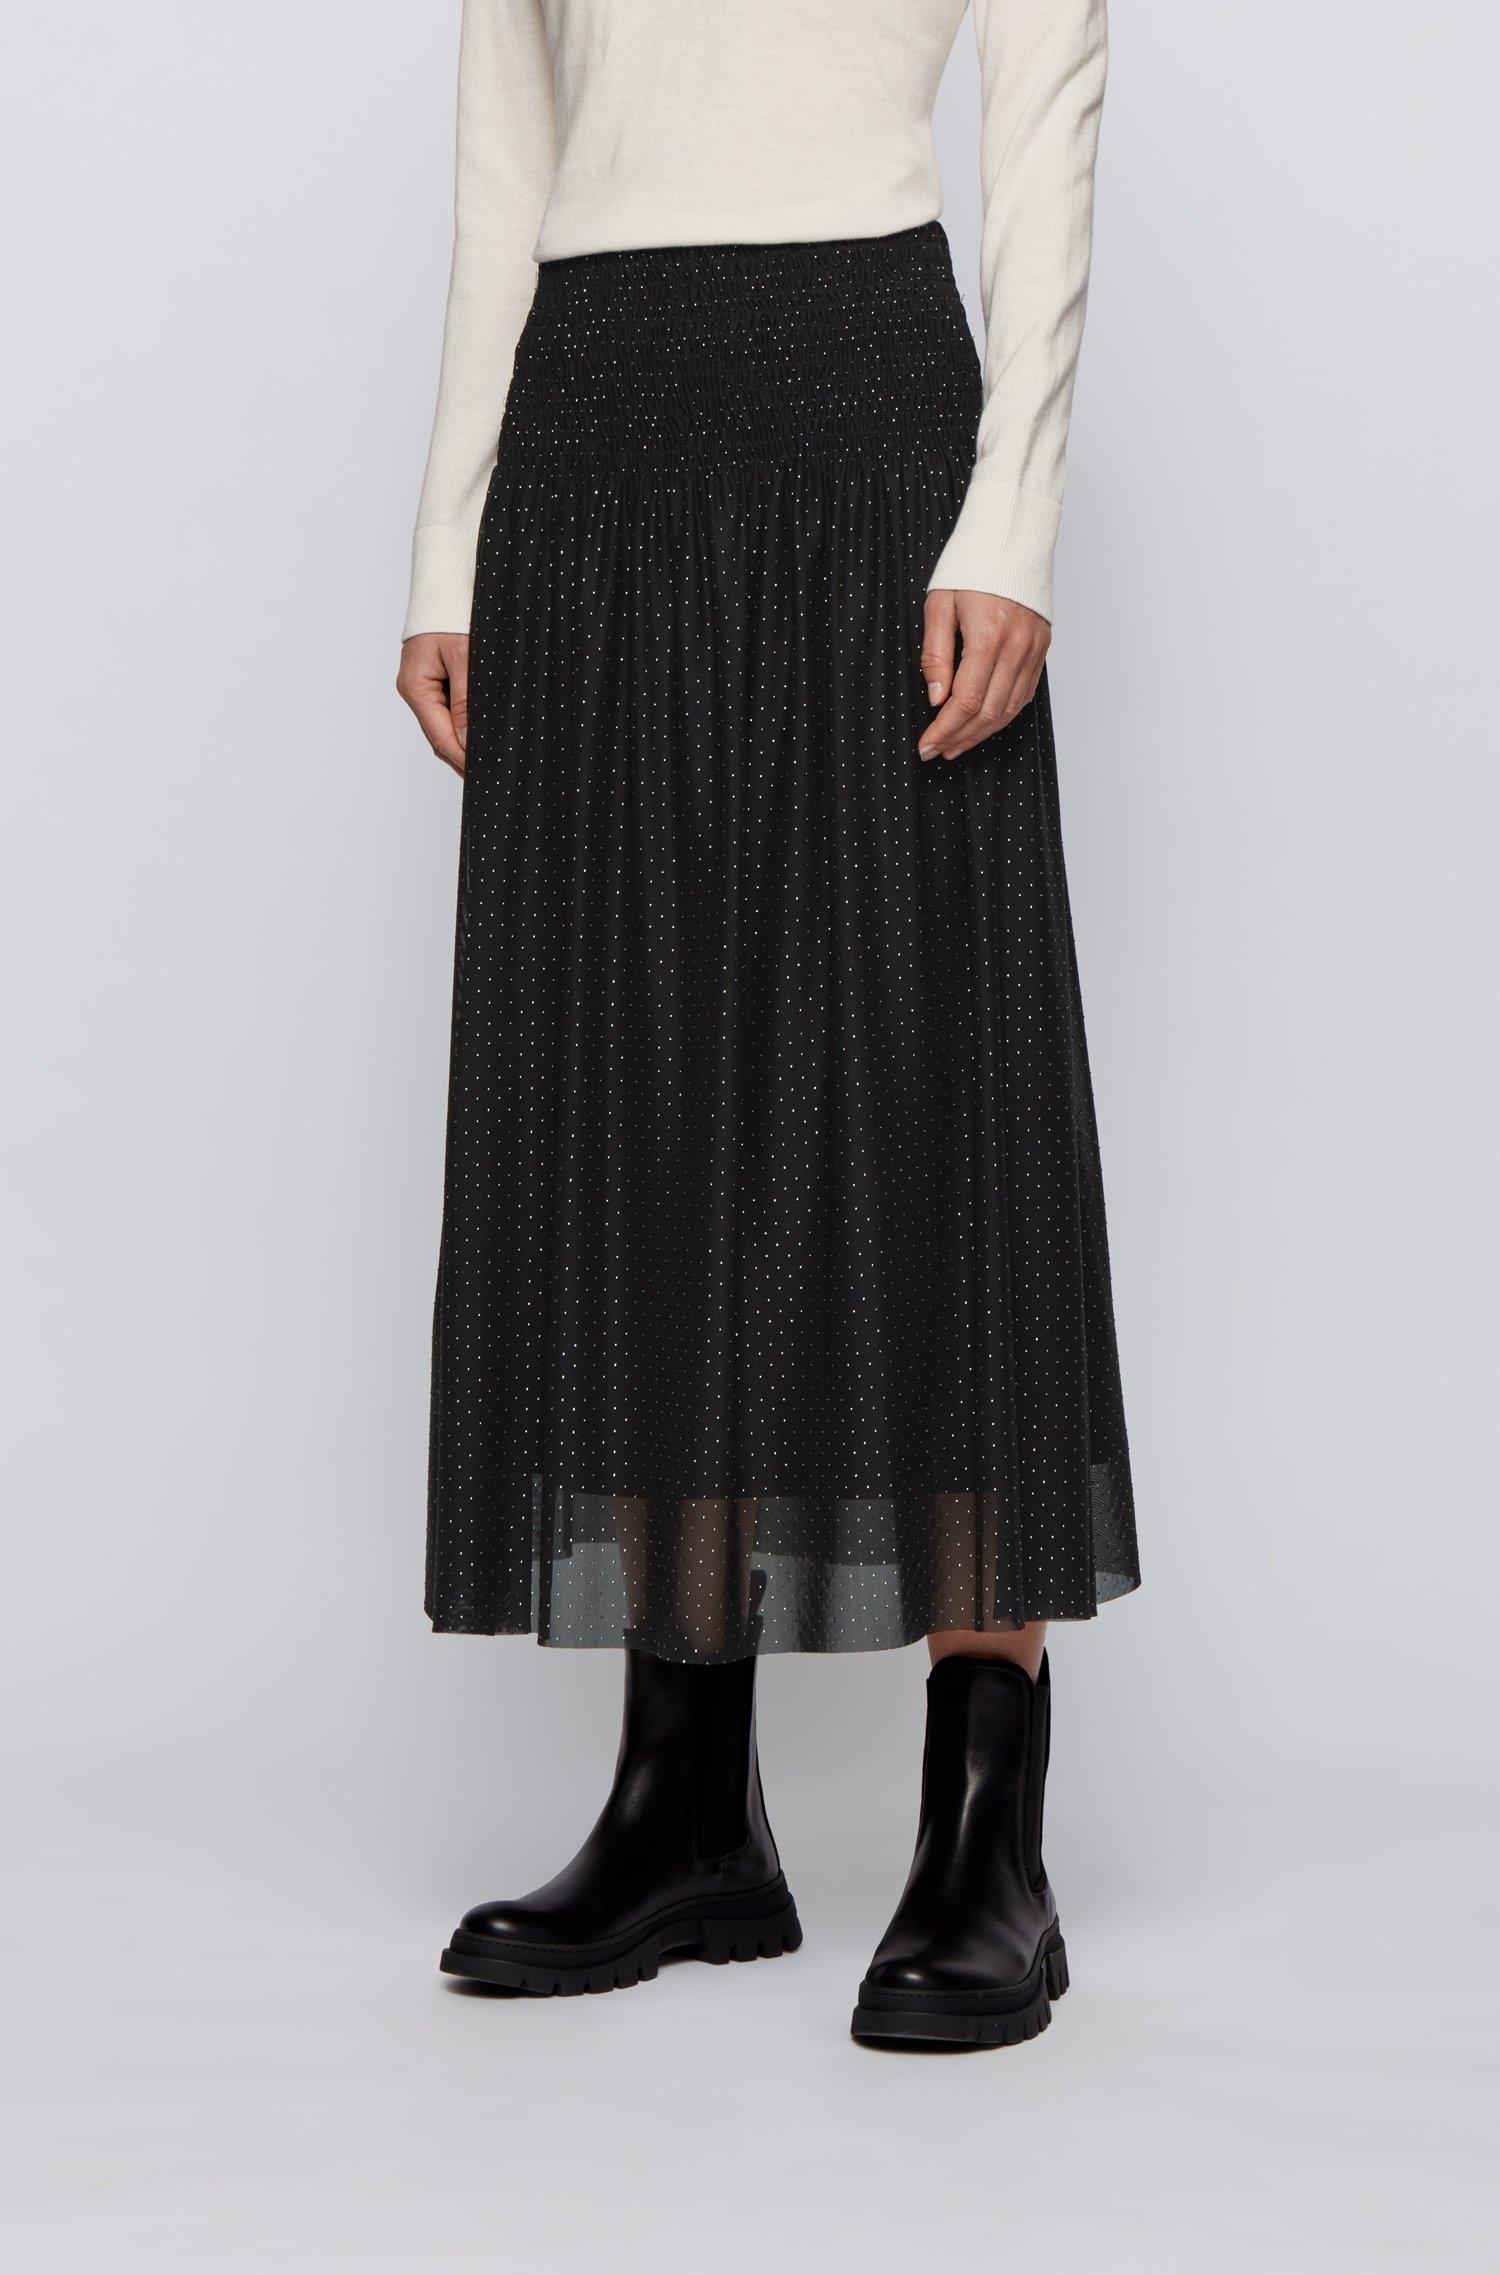 Smocked-waist skirt in tulle with metallic dot print, Black